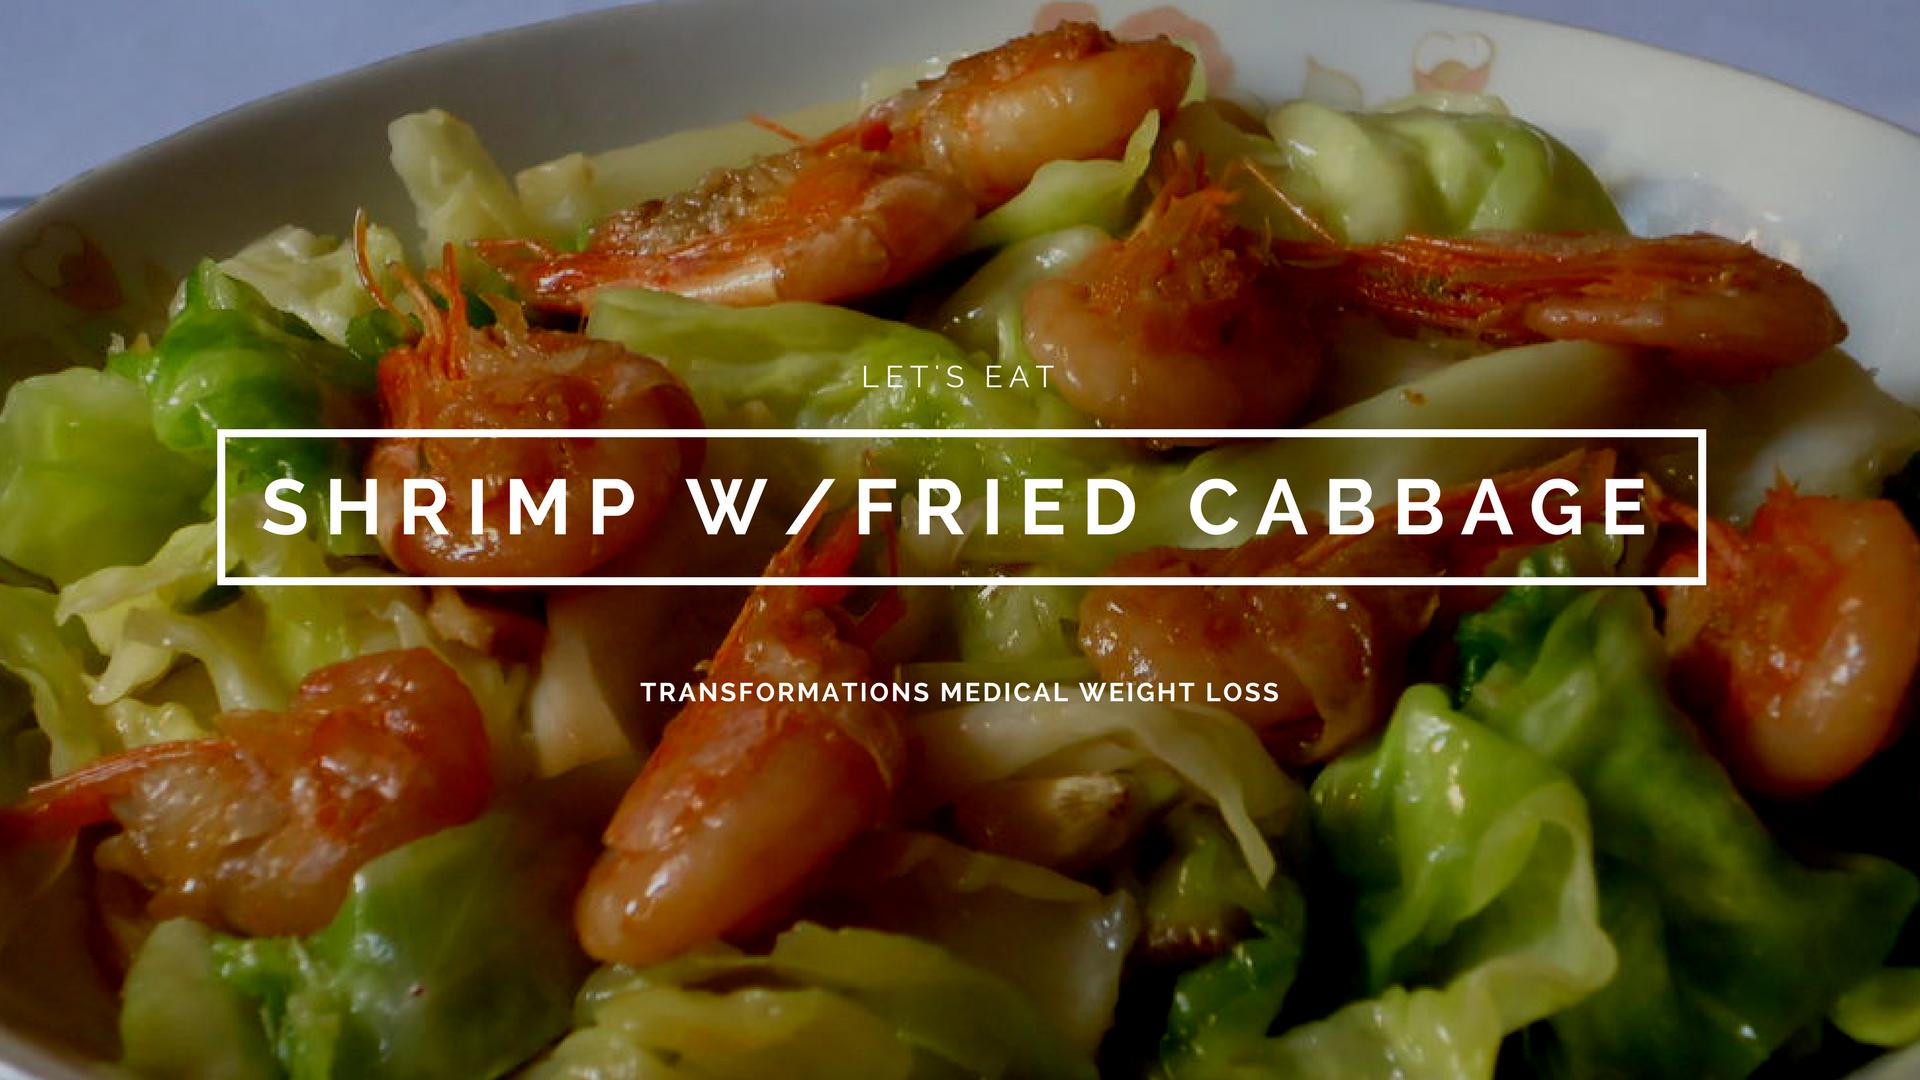 Shrimp w/Fried Cabbage